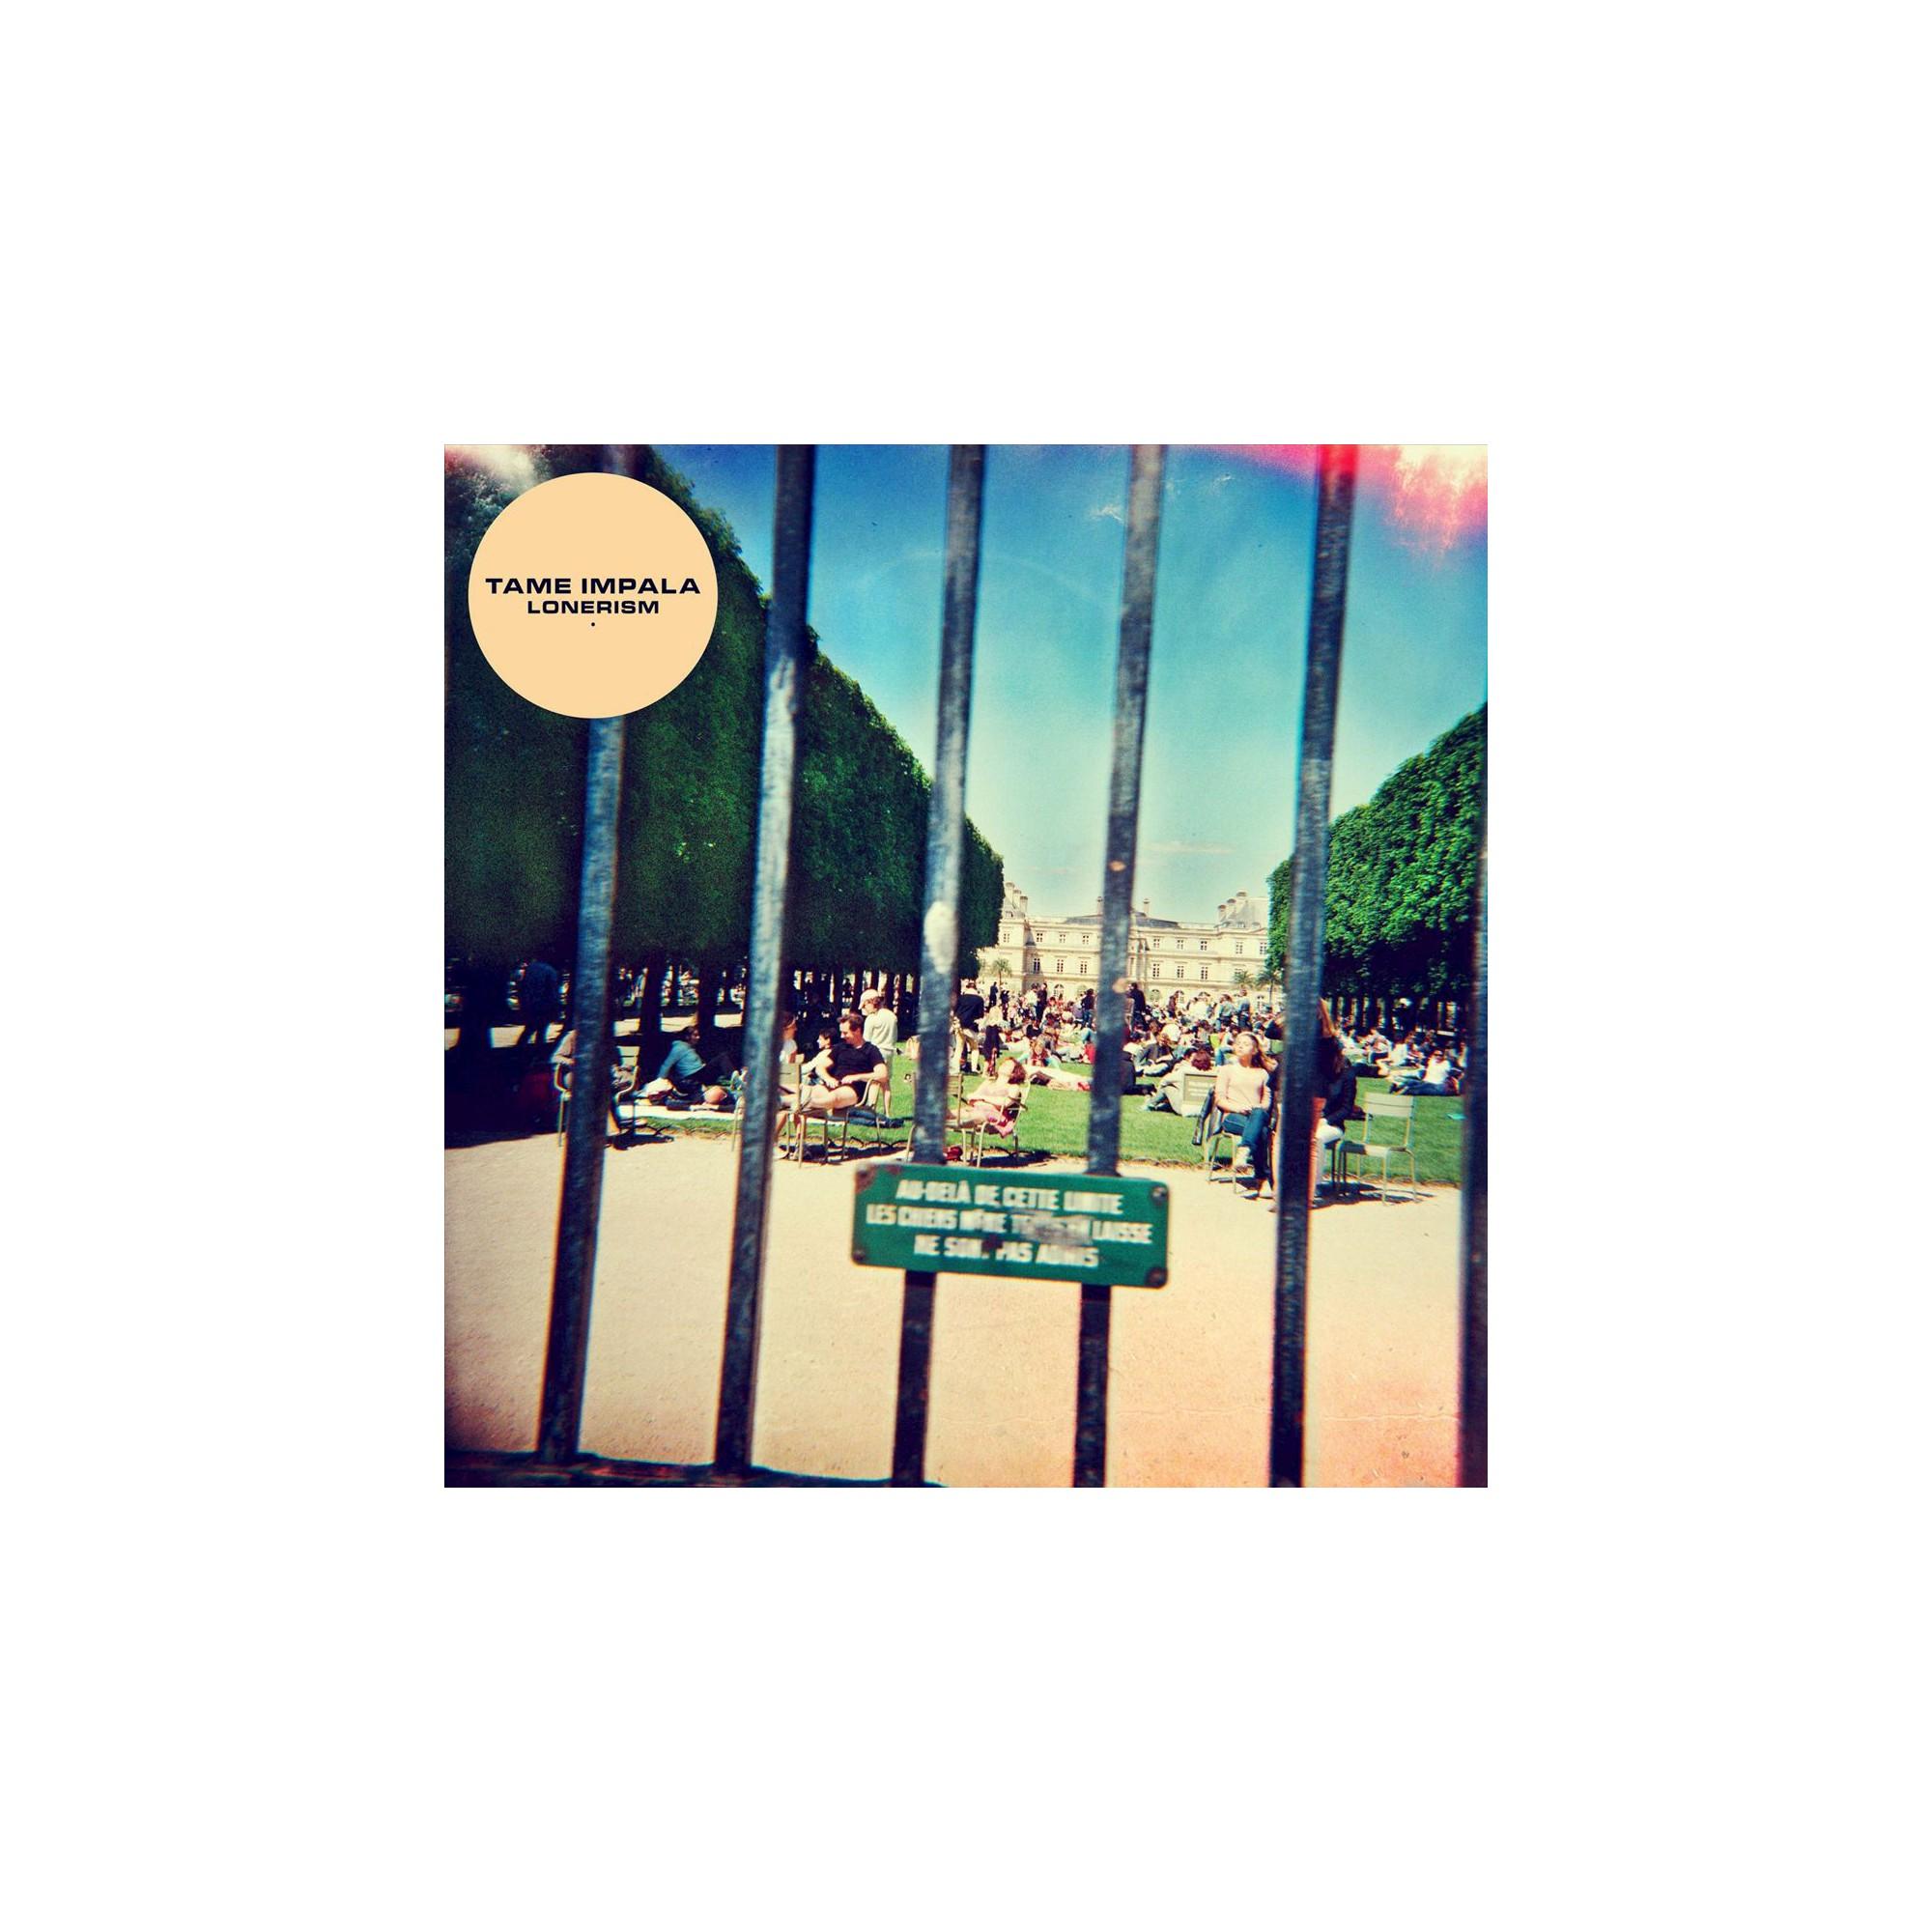 Tame Impala - Lonerism (Vinyl)